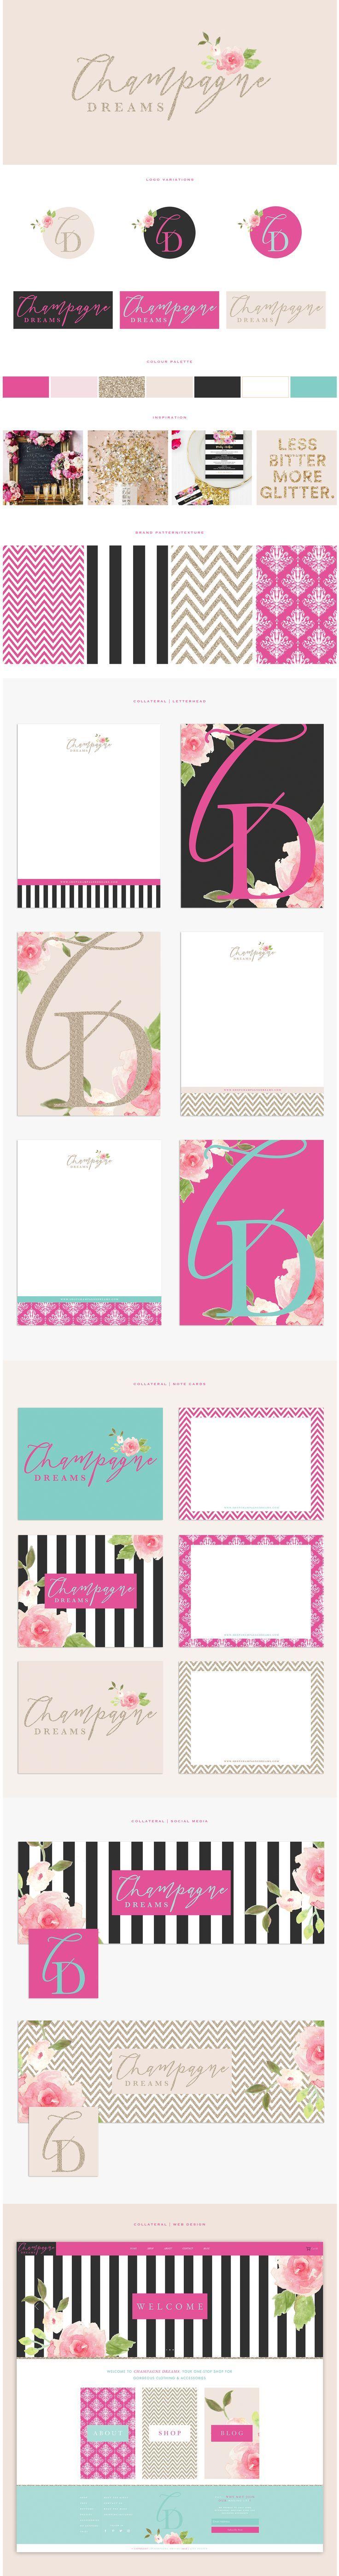 Brand Design by Brand Me Beautiful